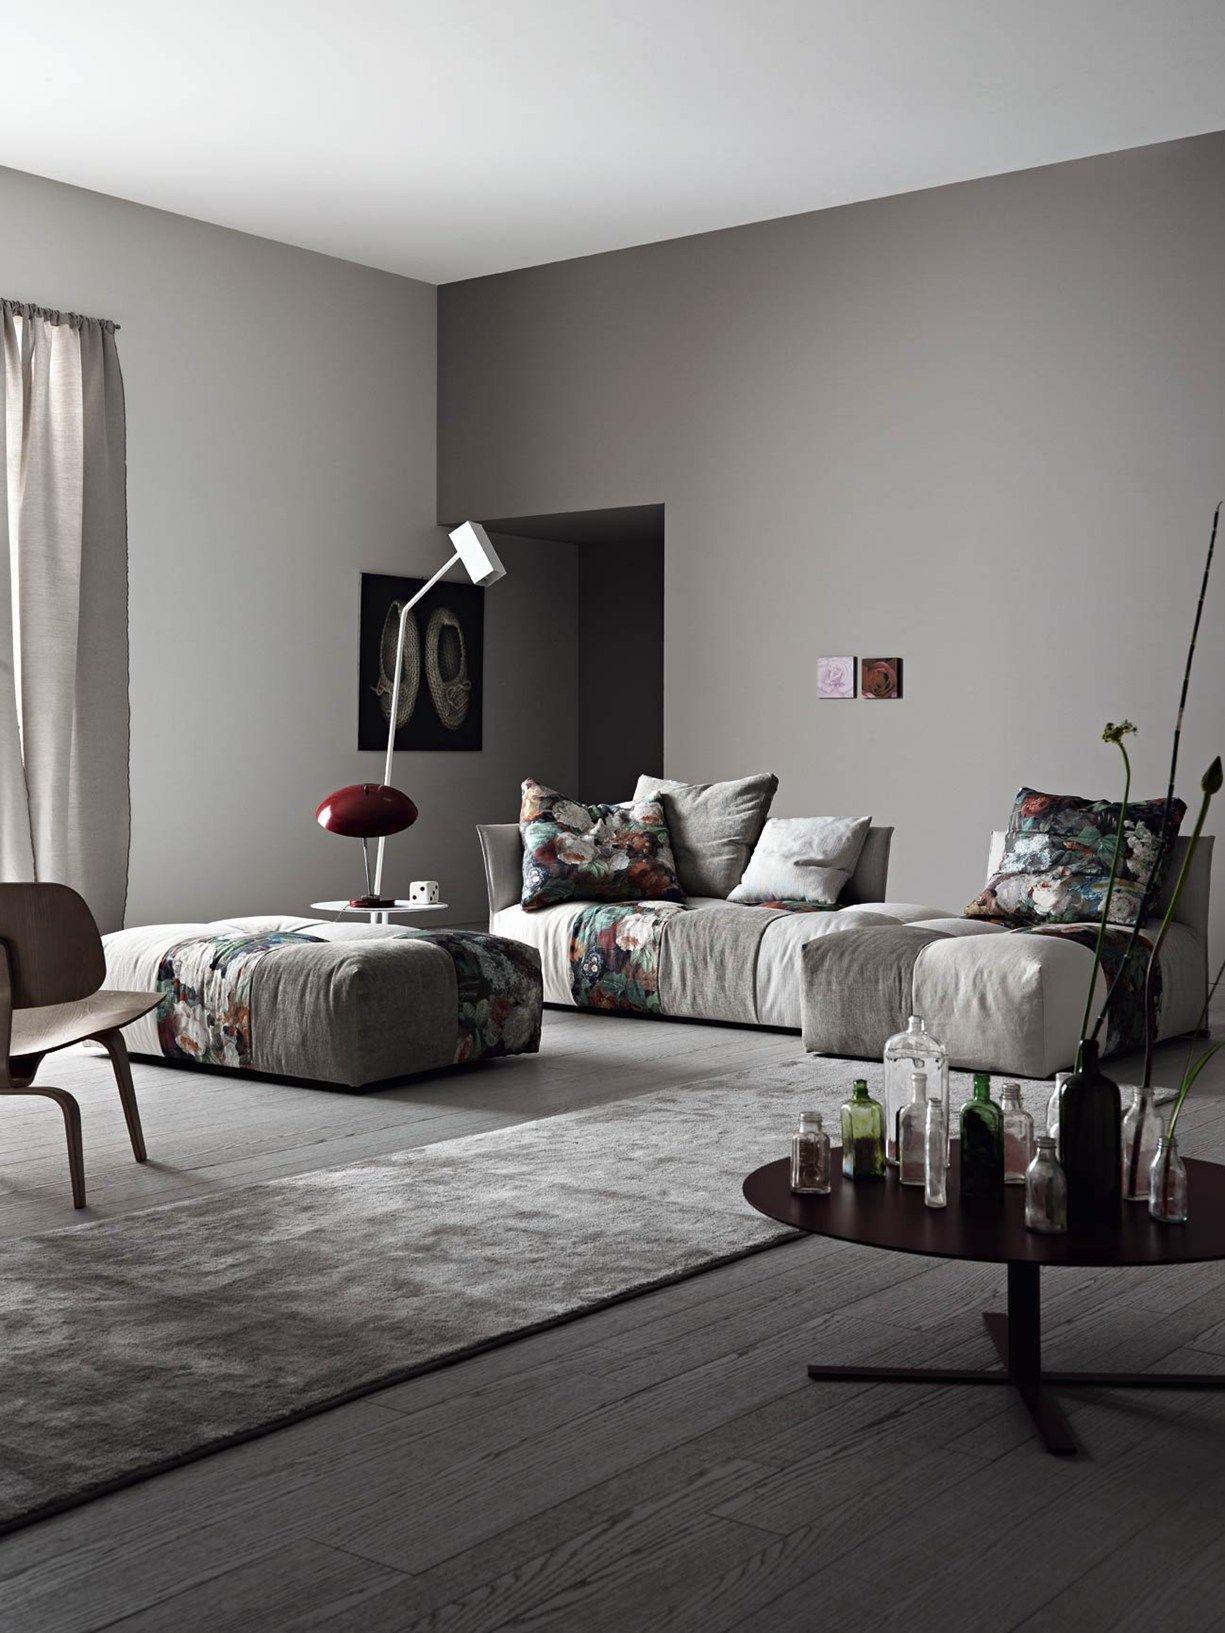 Modular elements freedom to compose Pixels sofa